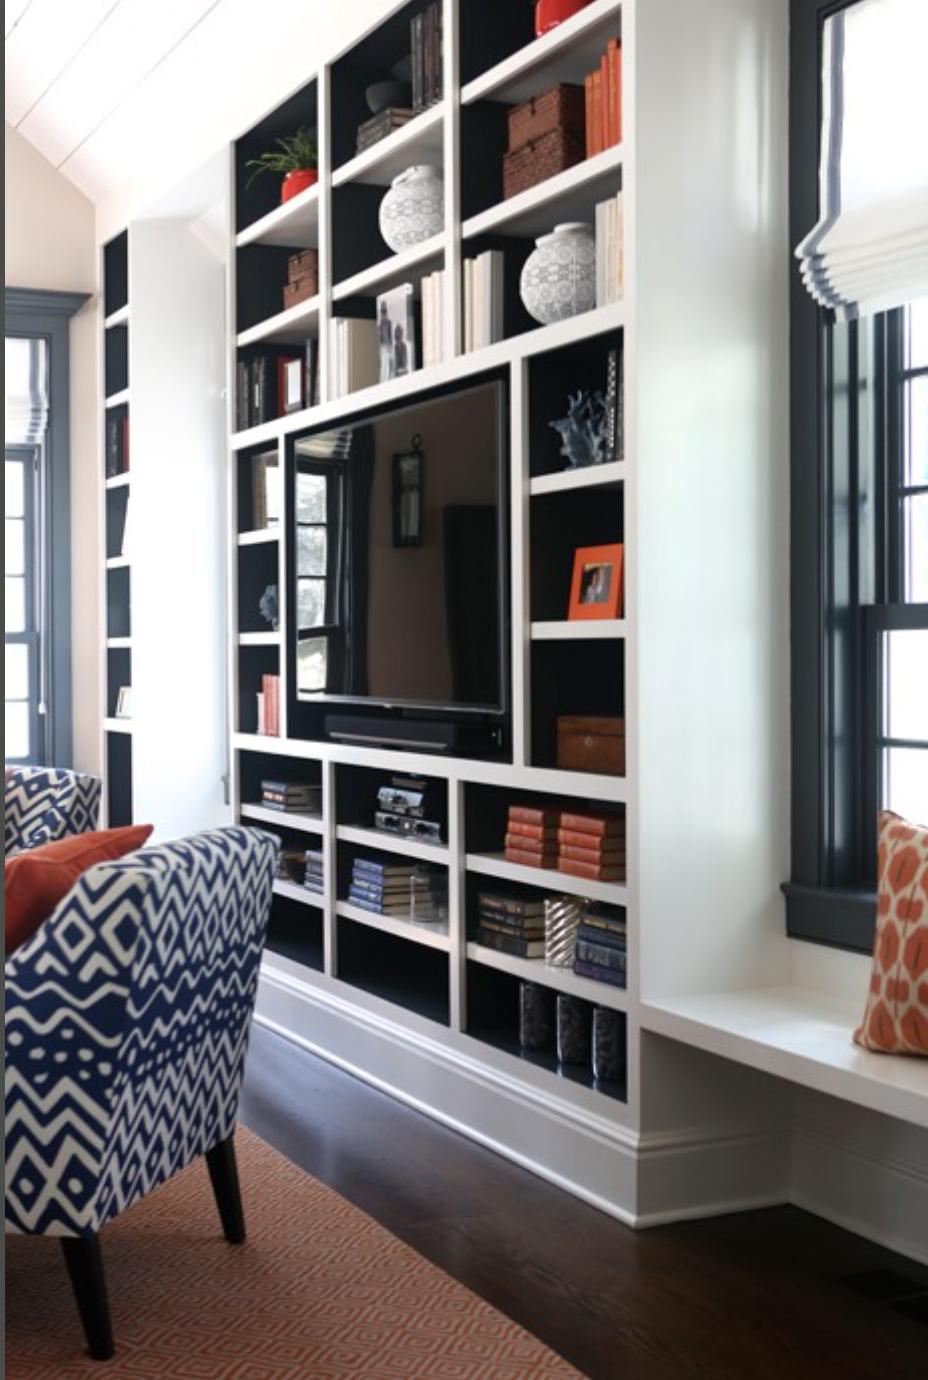 Organized Living Room Fair An Organized Living Room Home Decor  Pinterest  Living Rooms Review